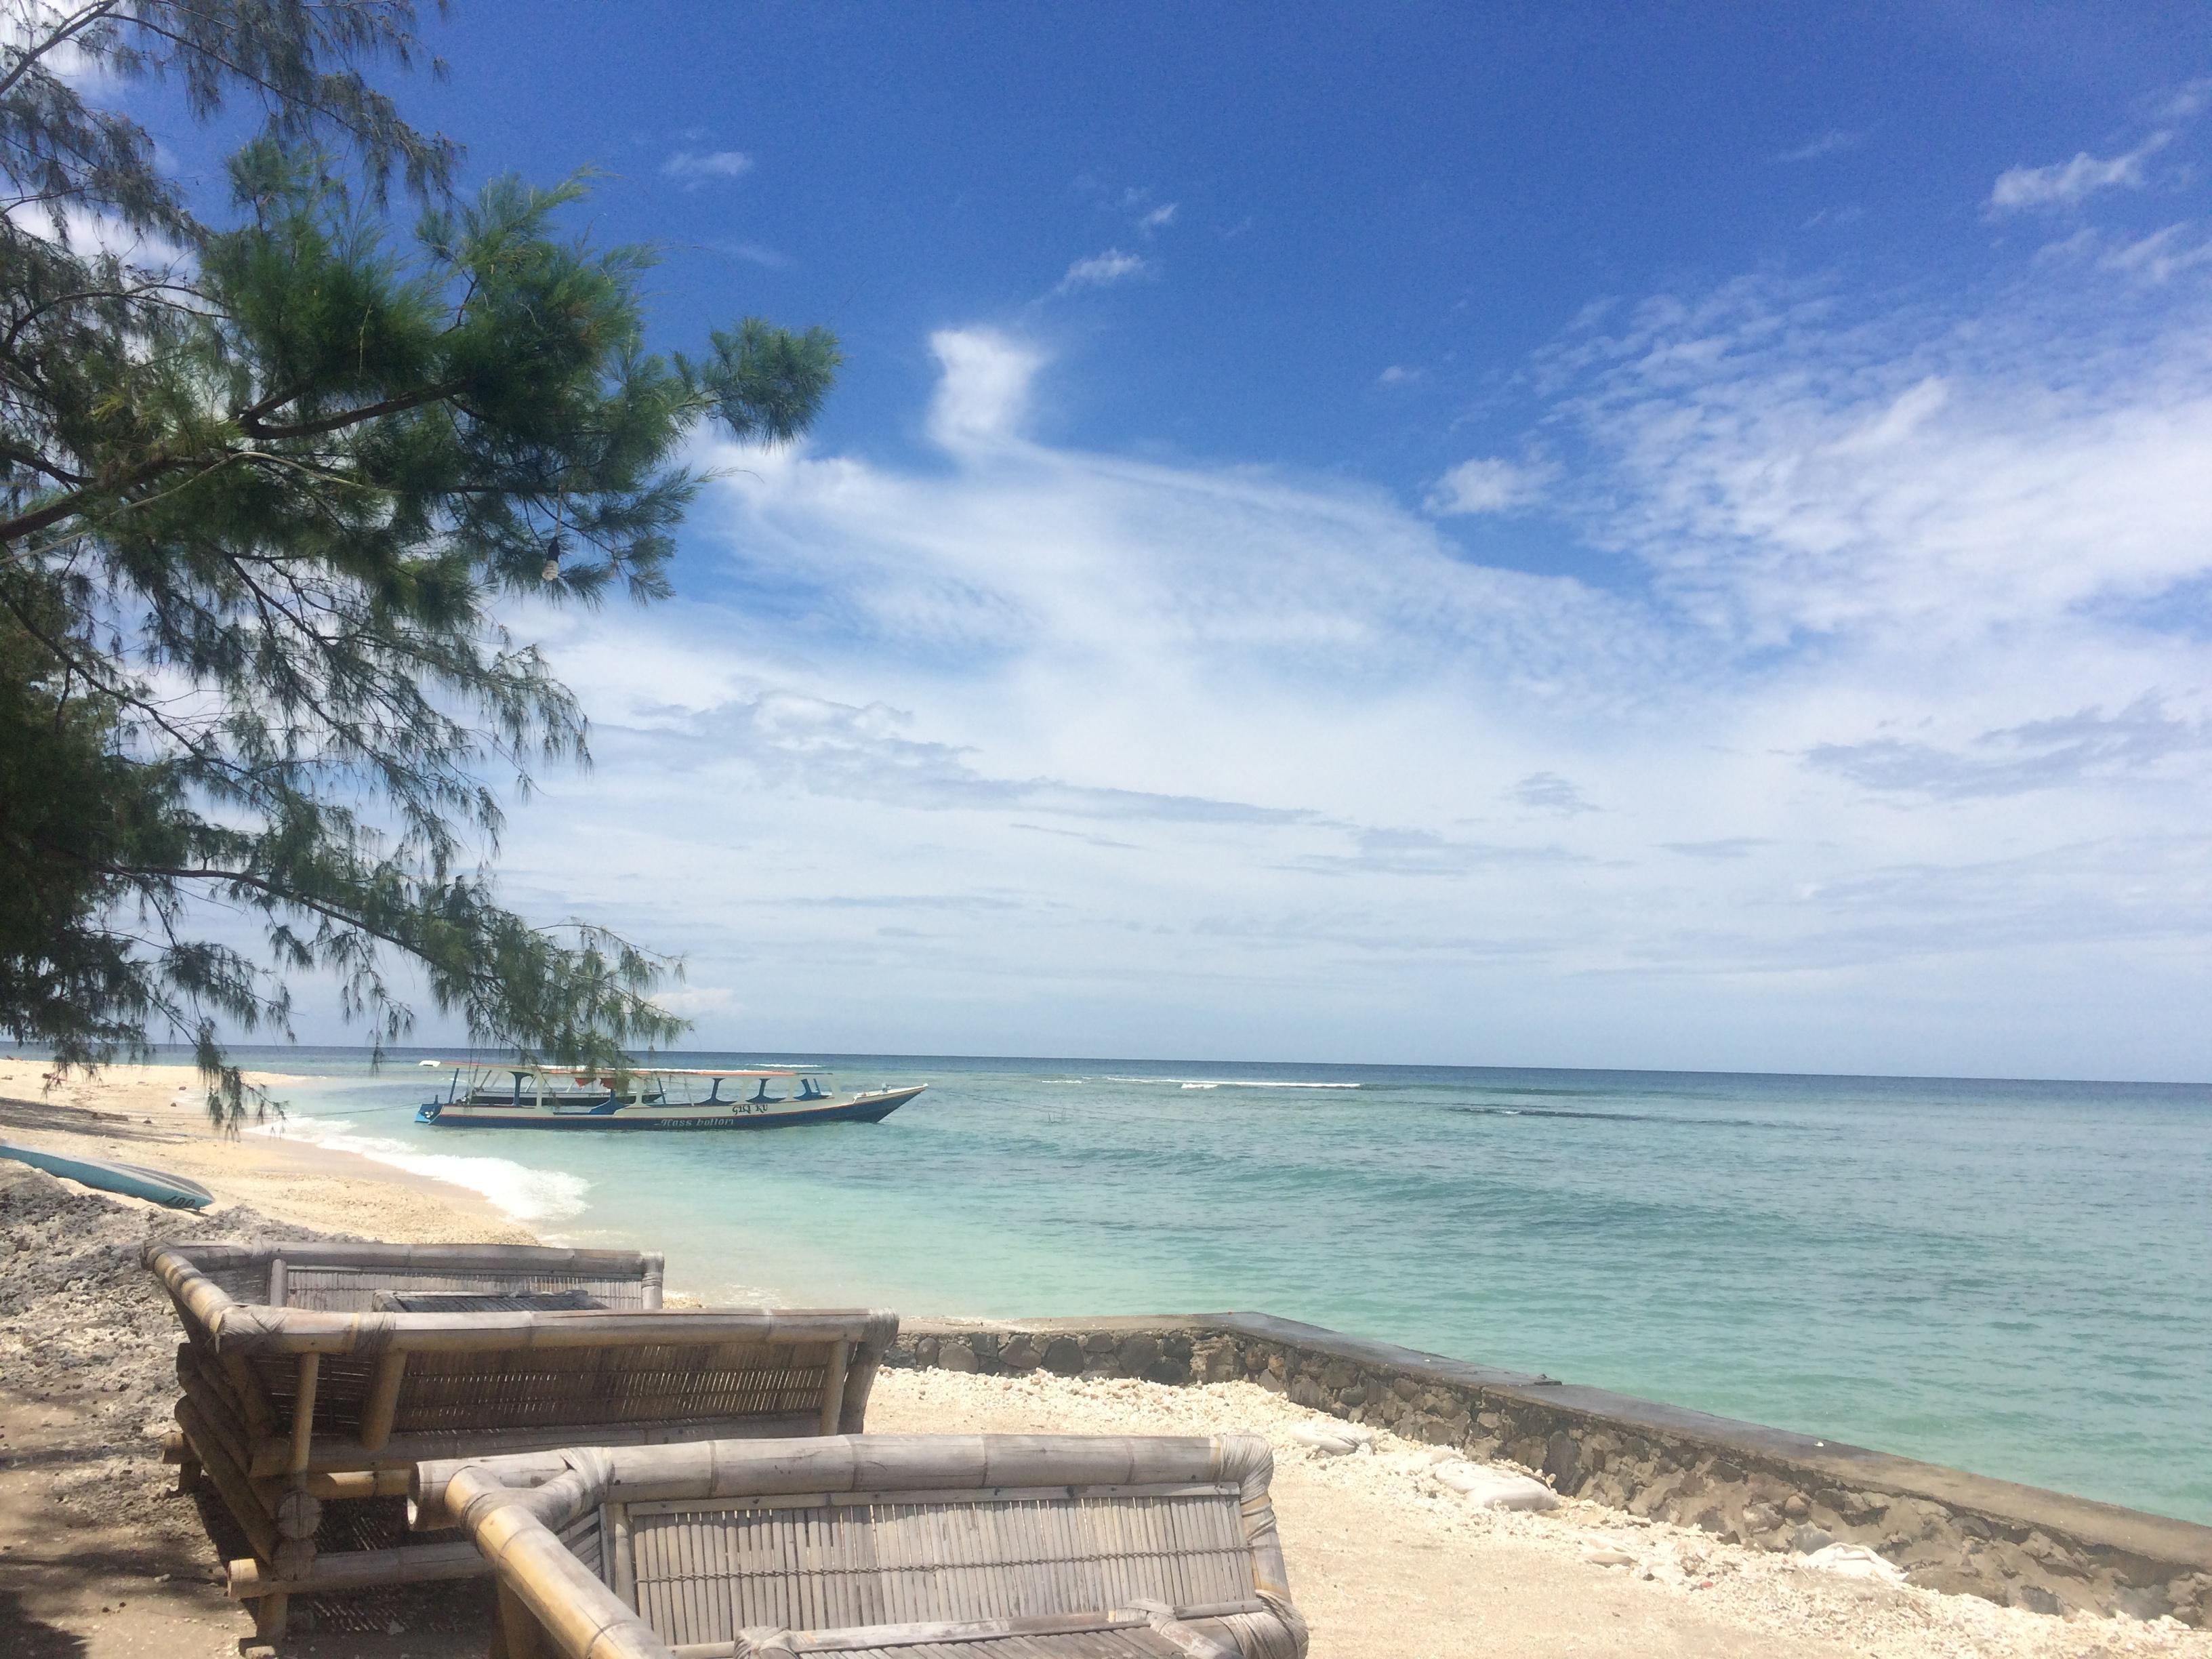 Plage sable blanc Gili Air, Indonésie